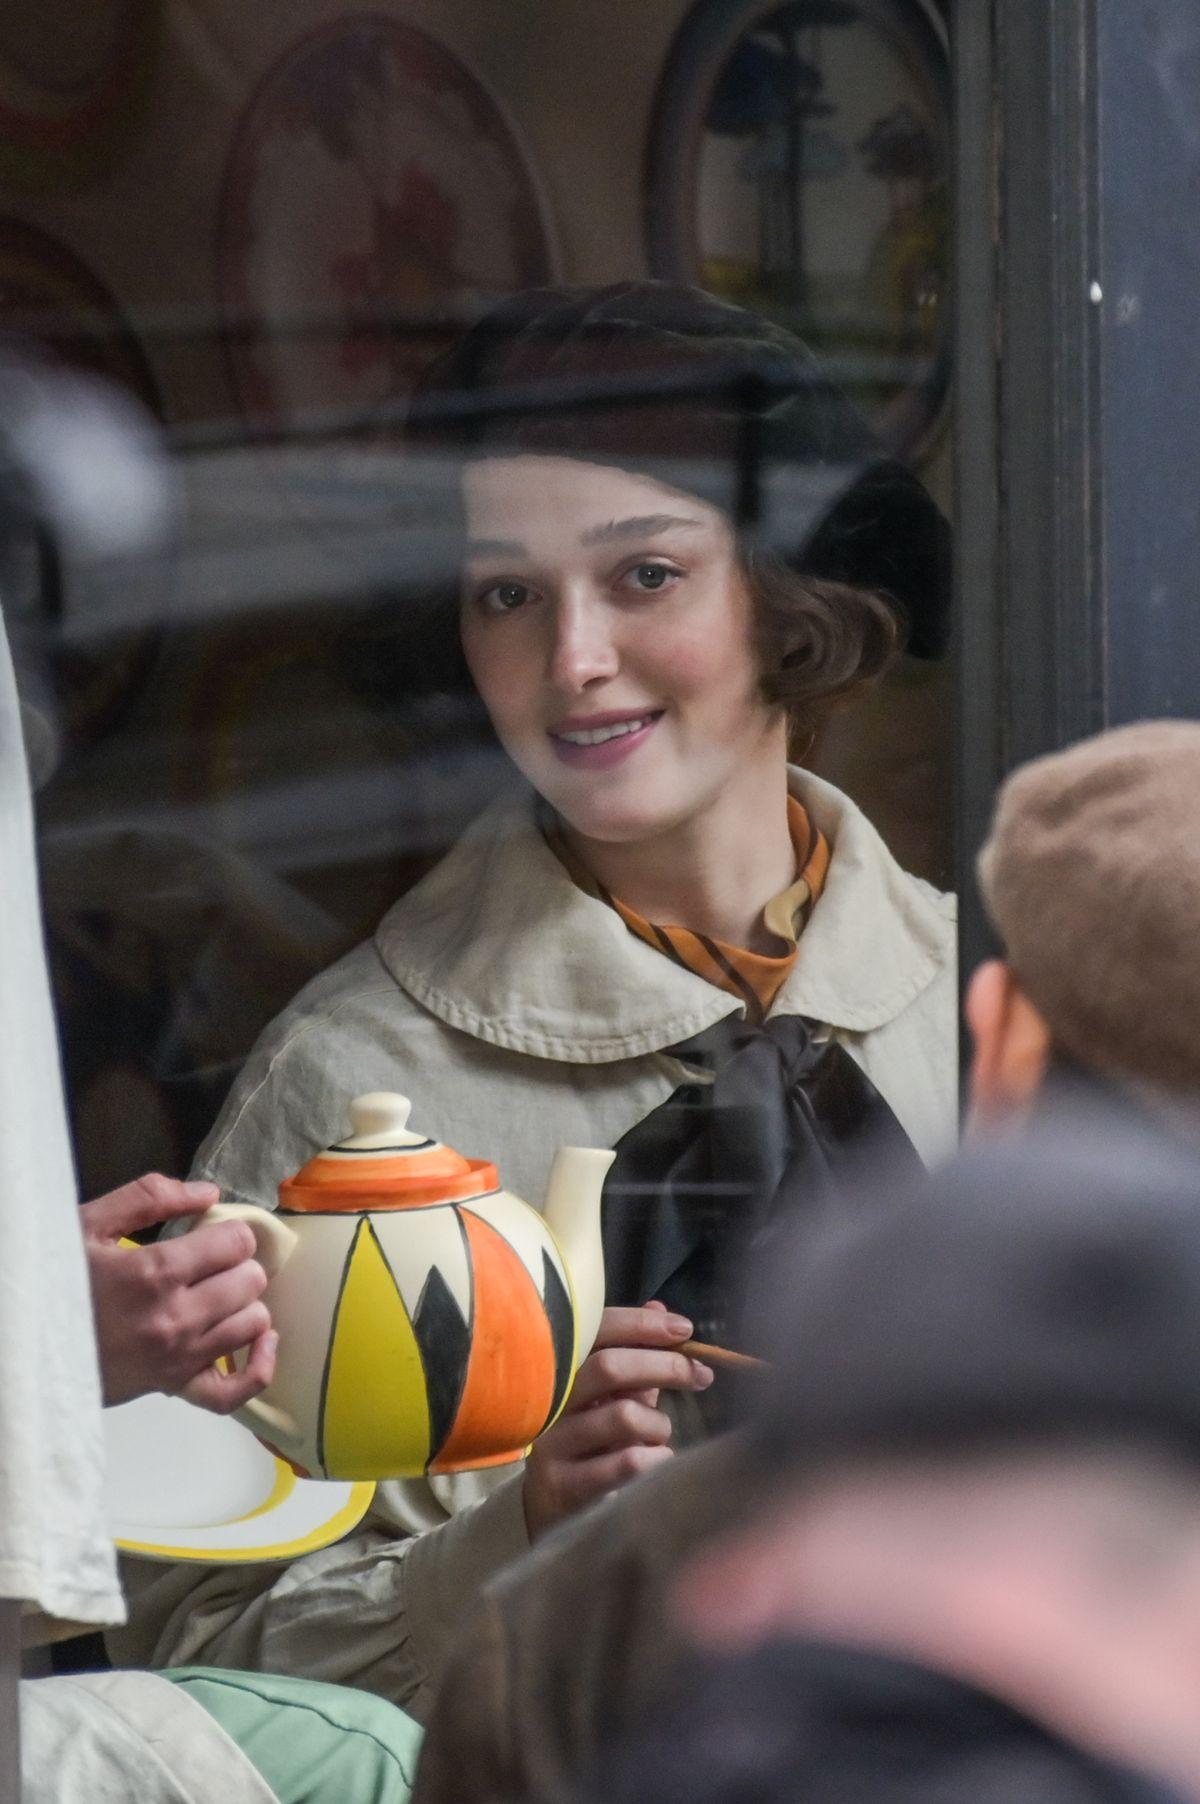 Bridgerton star Phoebe Dynevor filming The Colour Room in Birmingham. Photo: SnapperSK.